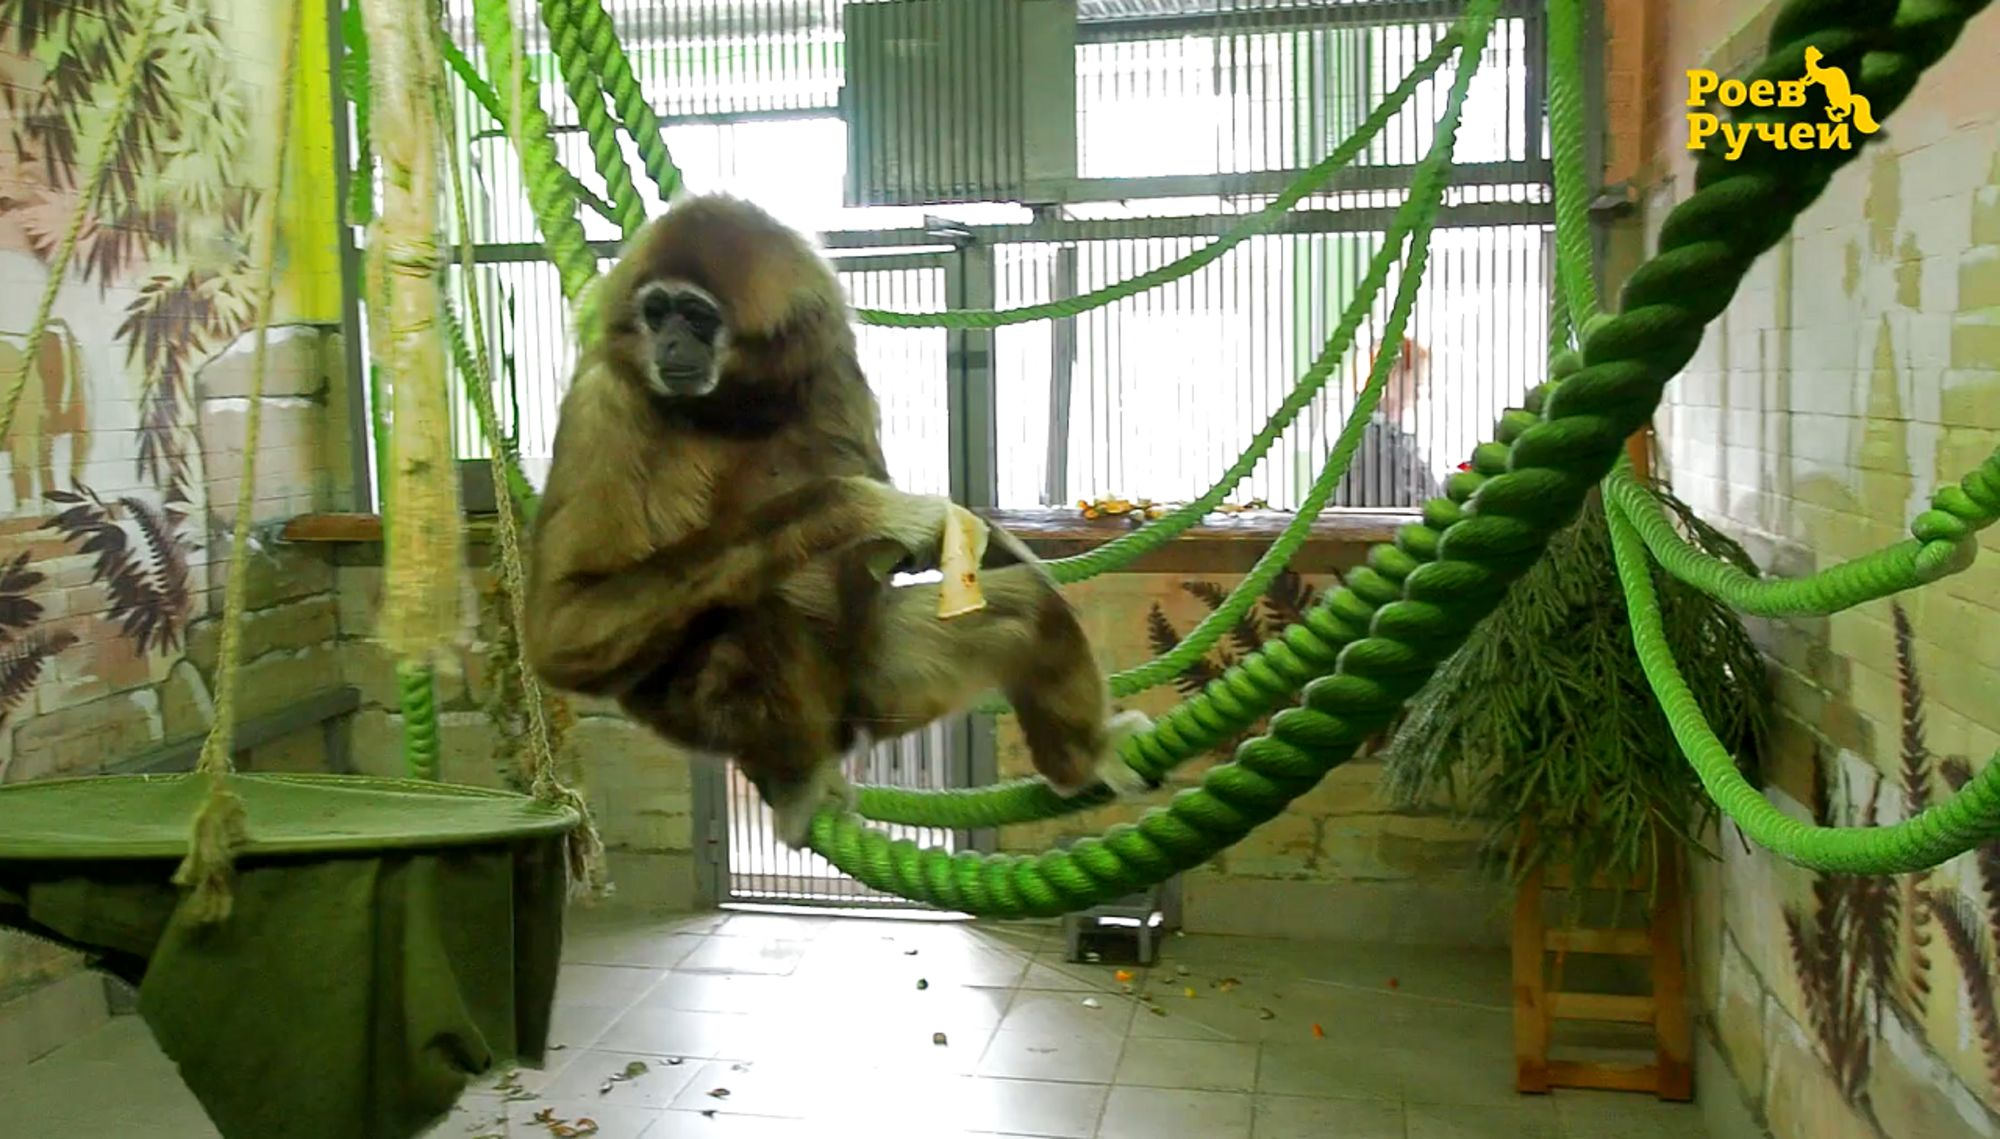 Обезьян красноярского зоопарка угостили блинами